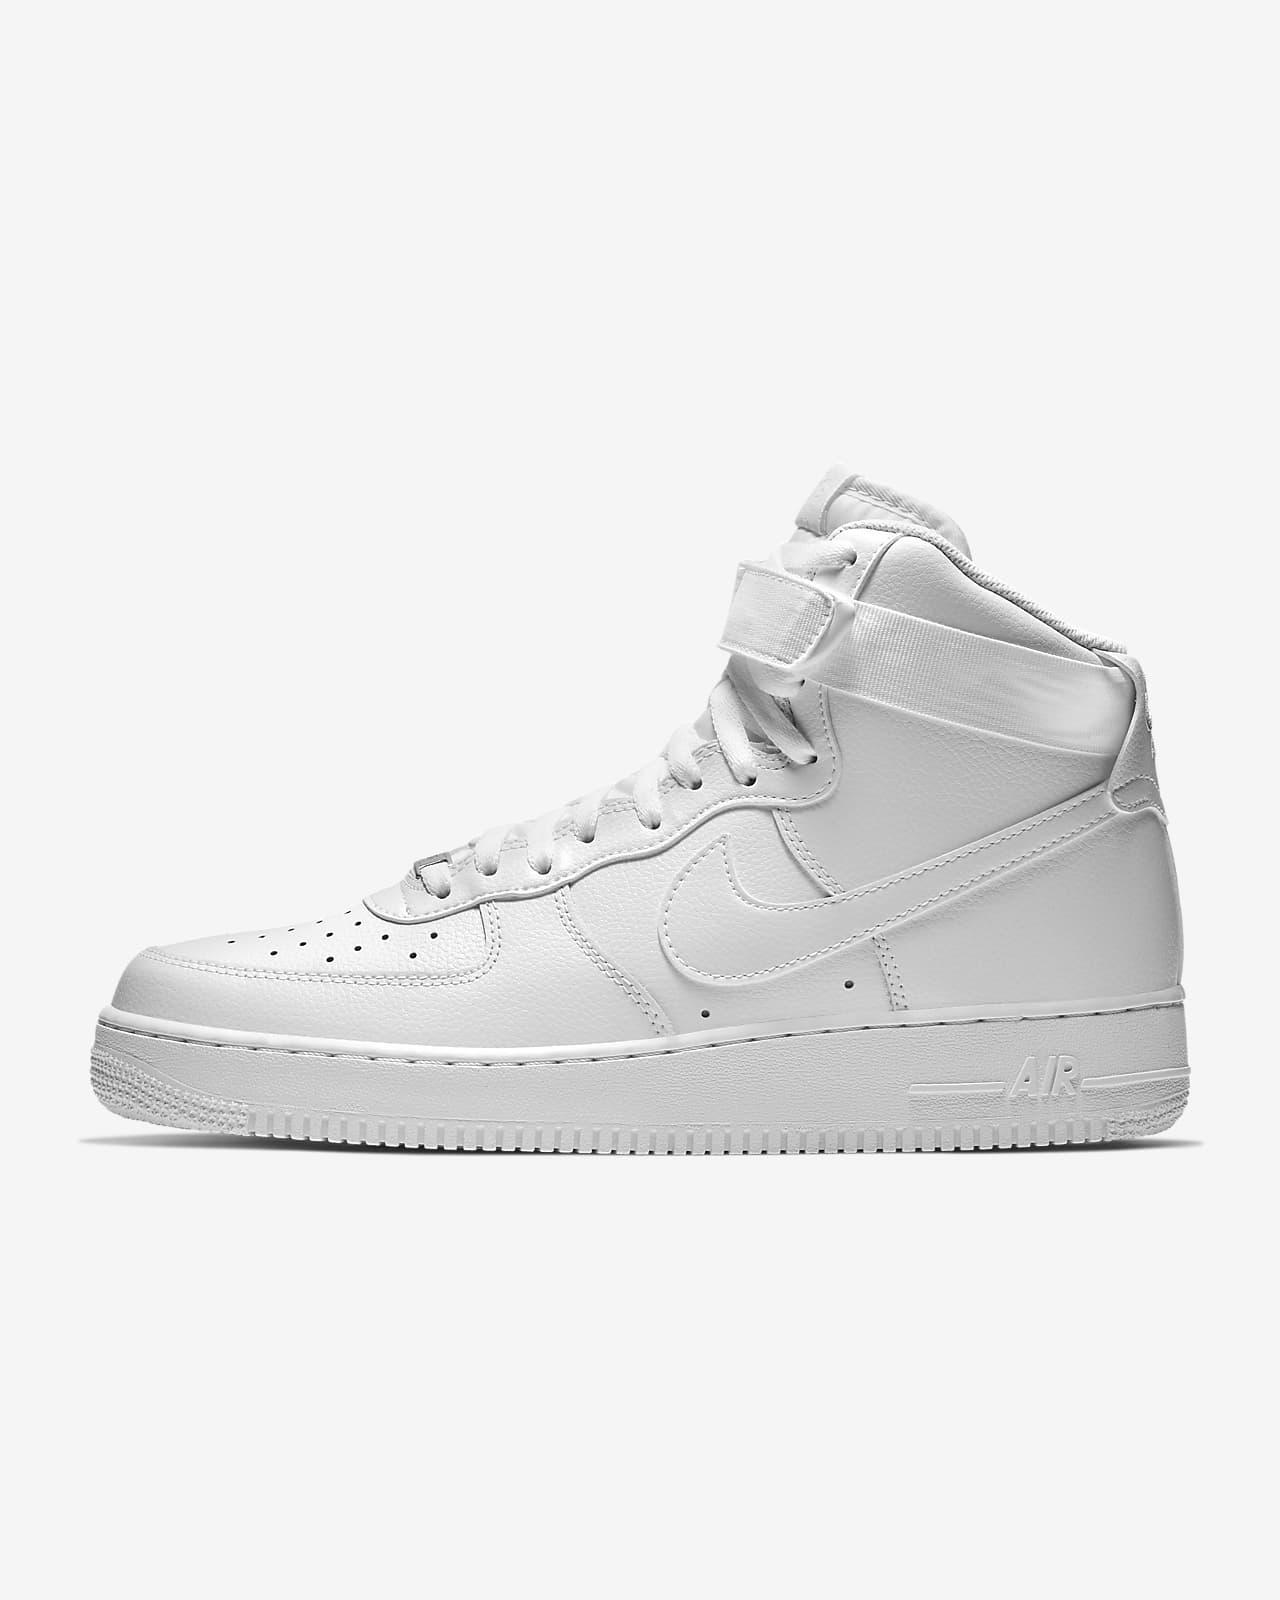 Nike Air Force 1 '07 High Men's Shoe